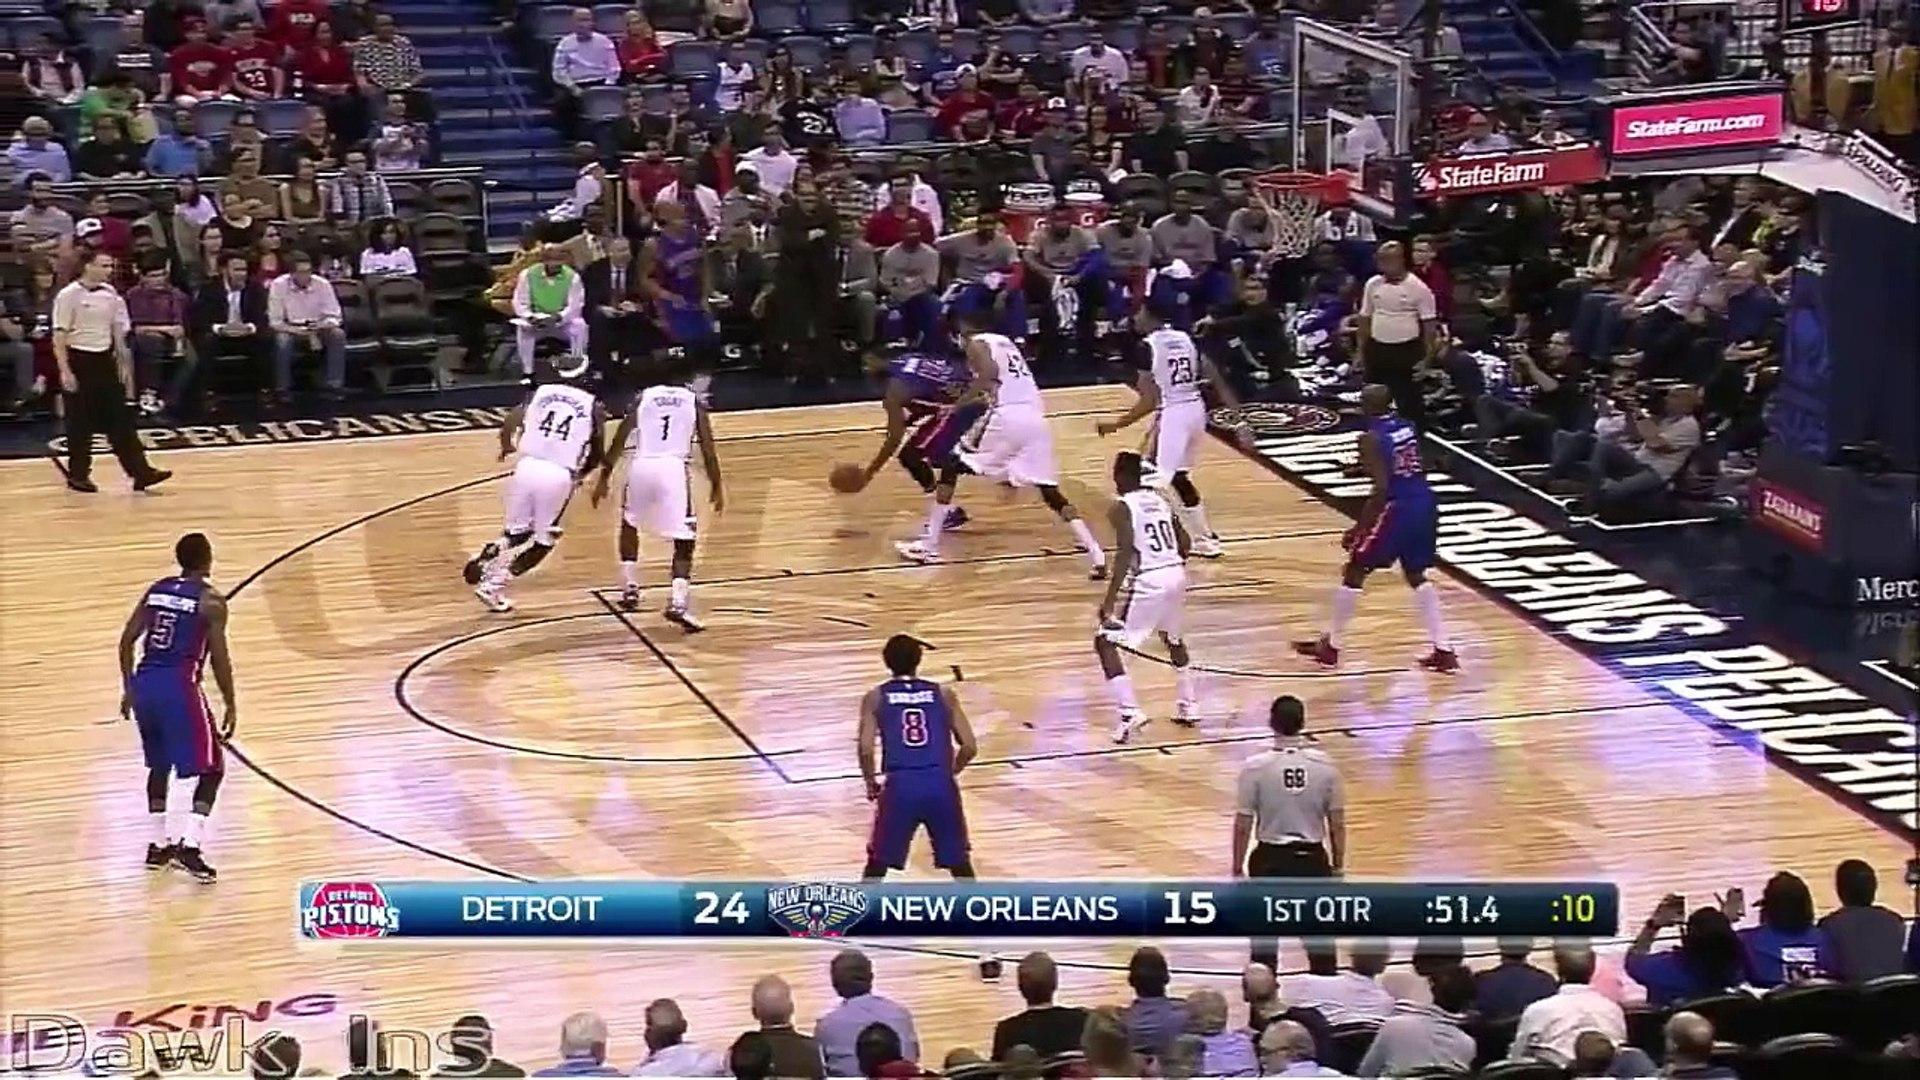 Anthony Davis Full Highlights 2015.03.04 vs Pistons - 39 Pts, 13 Rebs, 8 Blks, UNREAL!